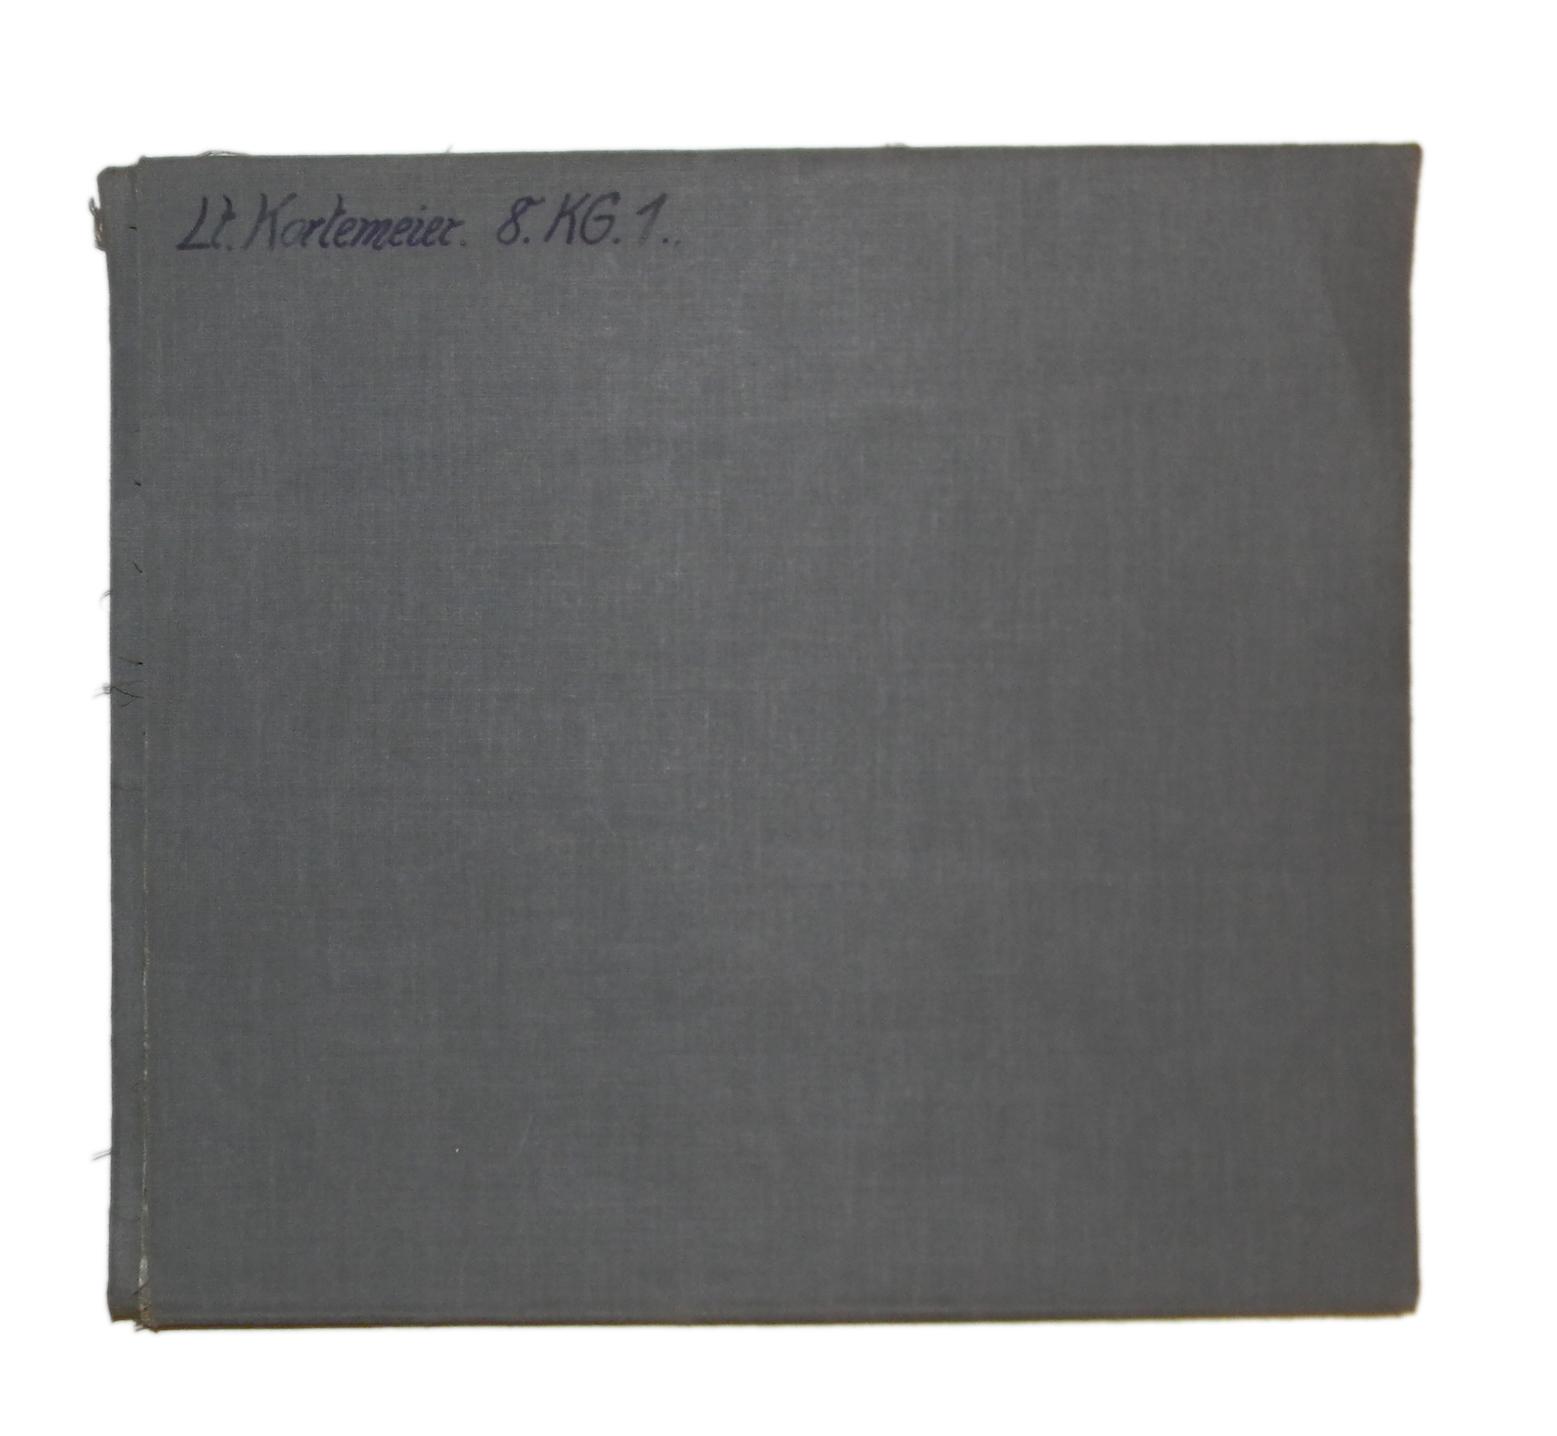 LW large blue linen chart